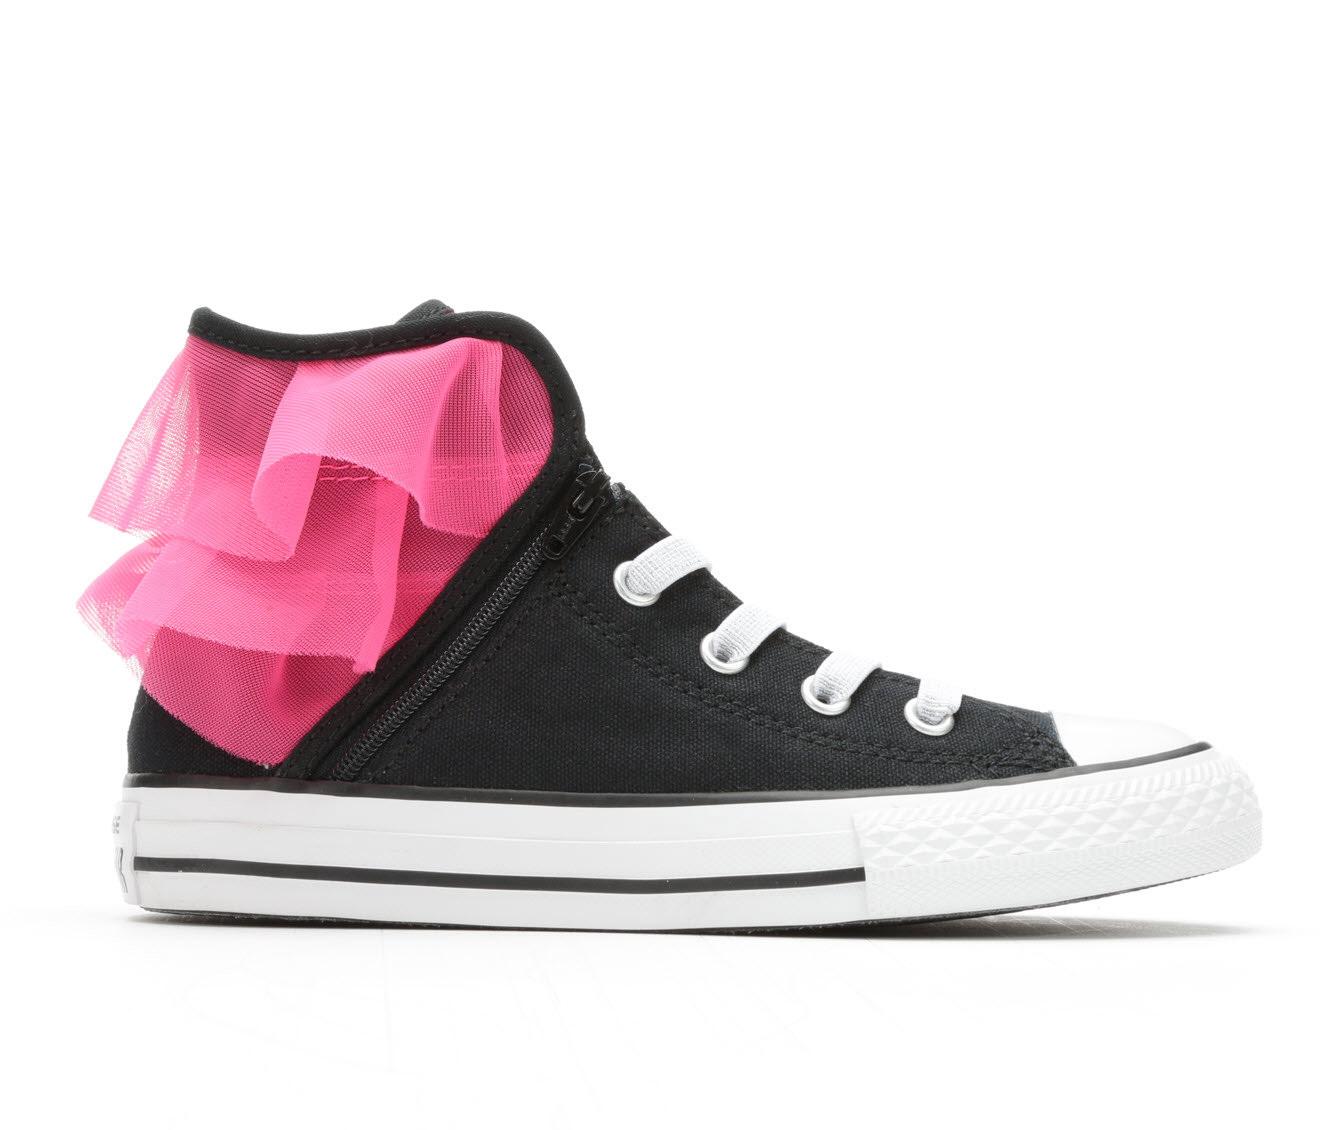 Girls' Converse Chuck Taylor All Star Block Party Hi Sneakers (Black)